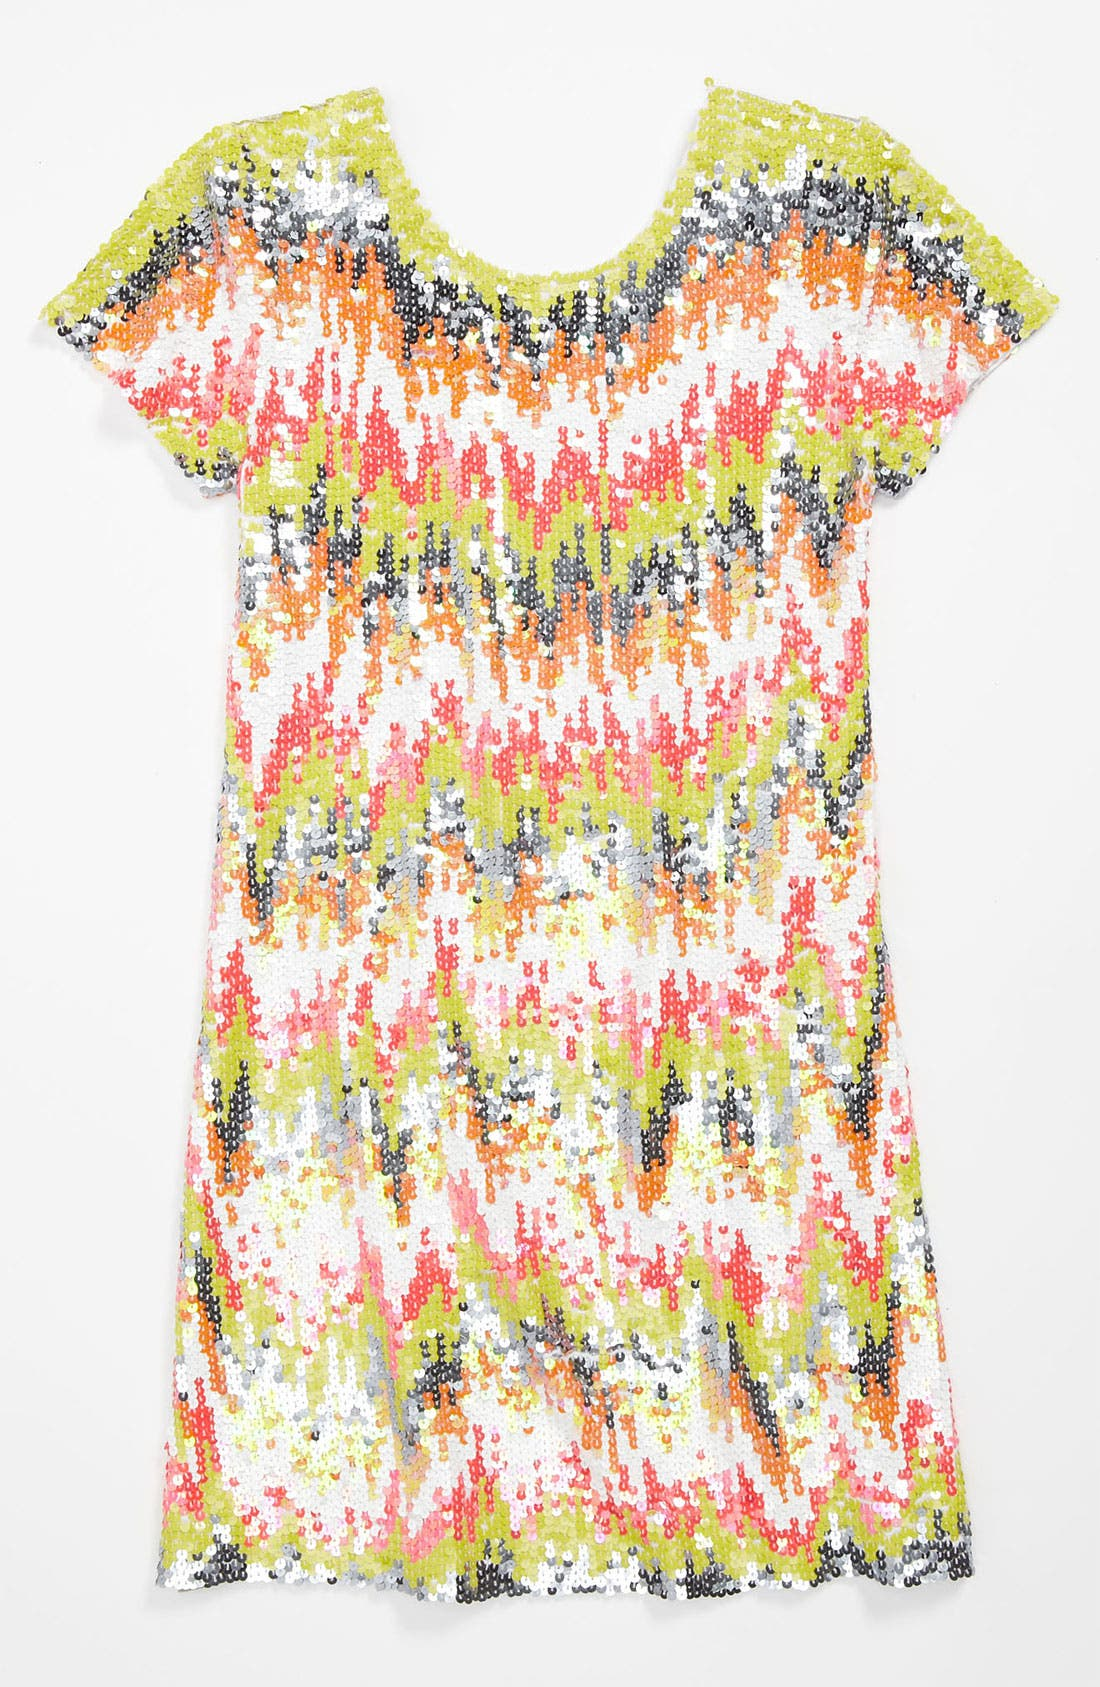 Alternate Image 1 Selected - Flowers by Zoe Sequin Dress (Big Girls)